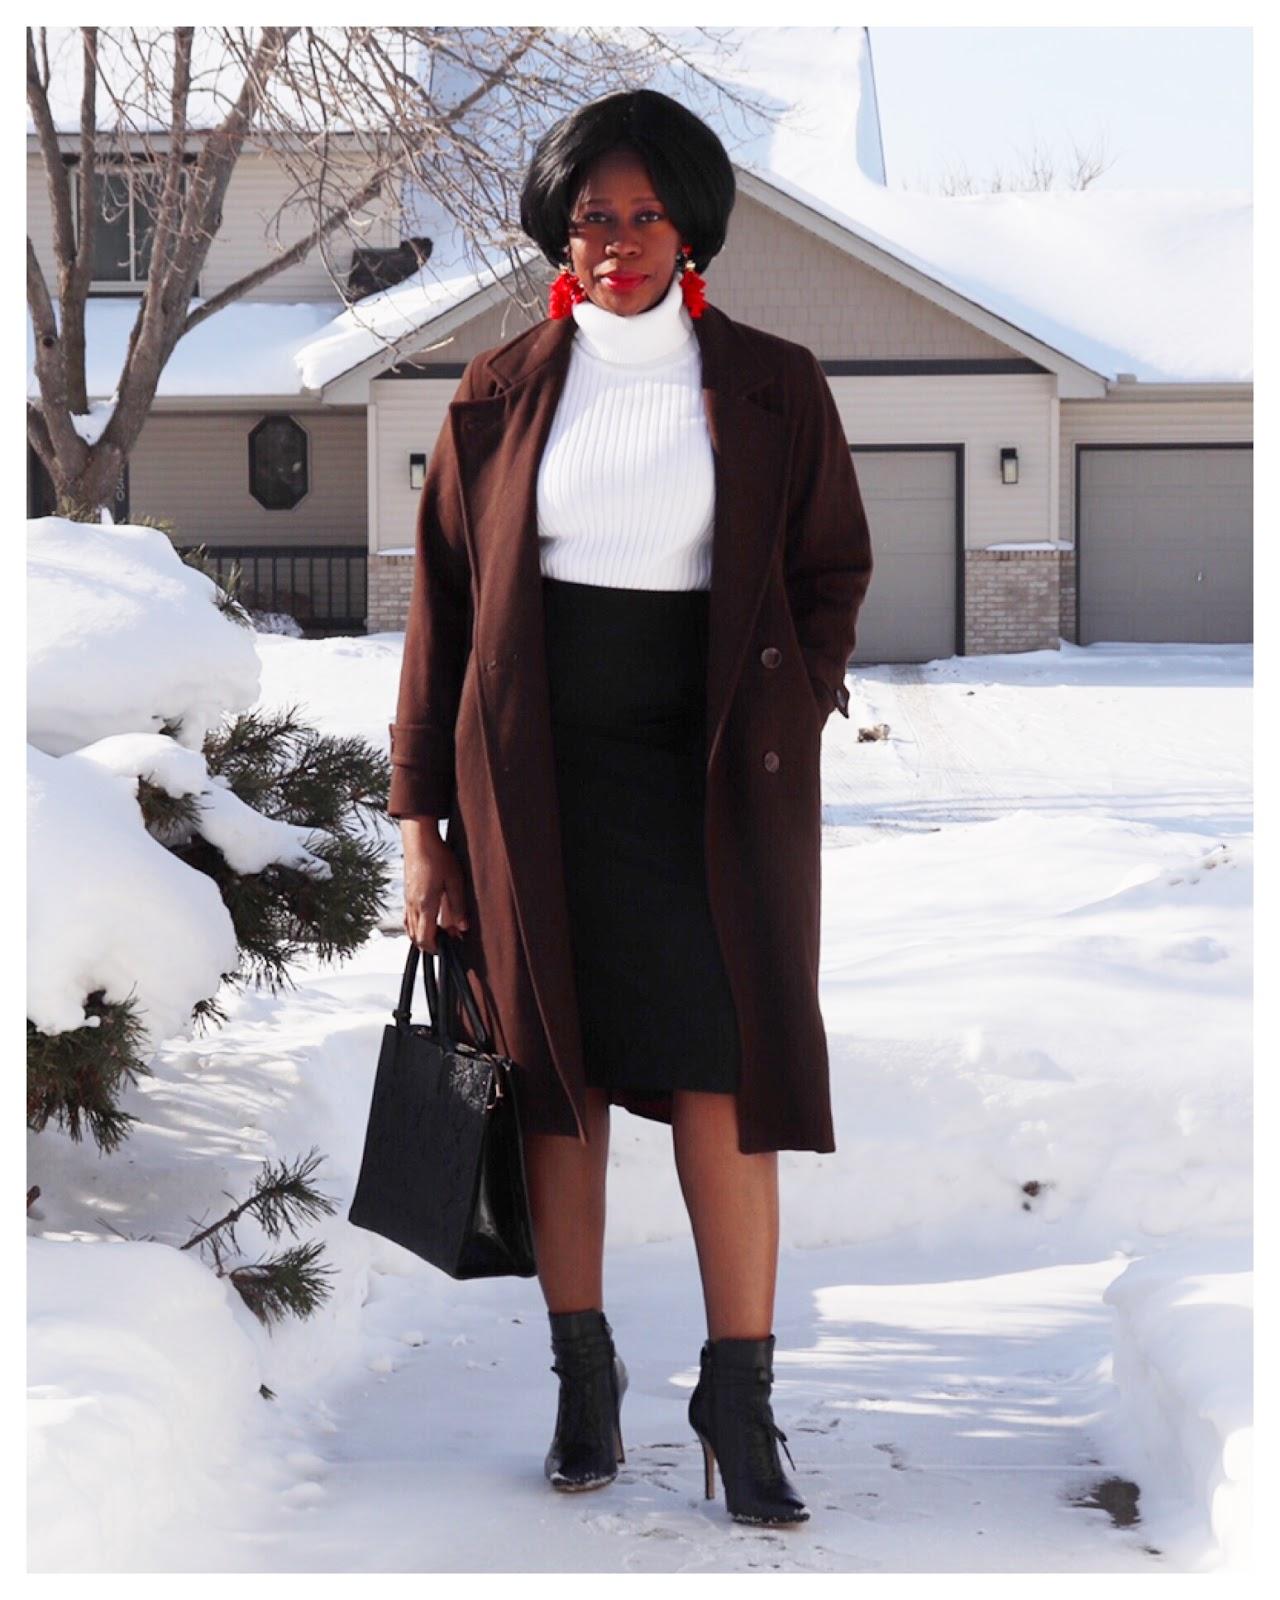 Fashion Beauty Zone: Beauty's Fashion Zone: White Turtle Neck Sweater + Black